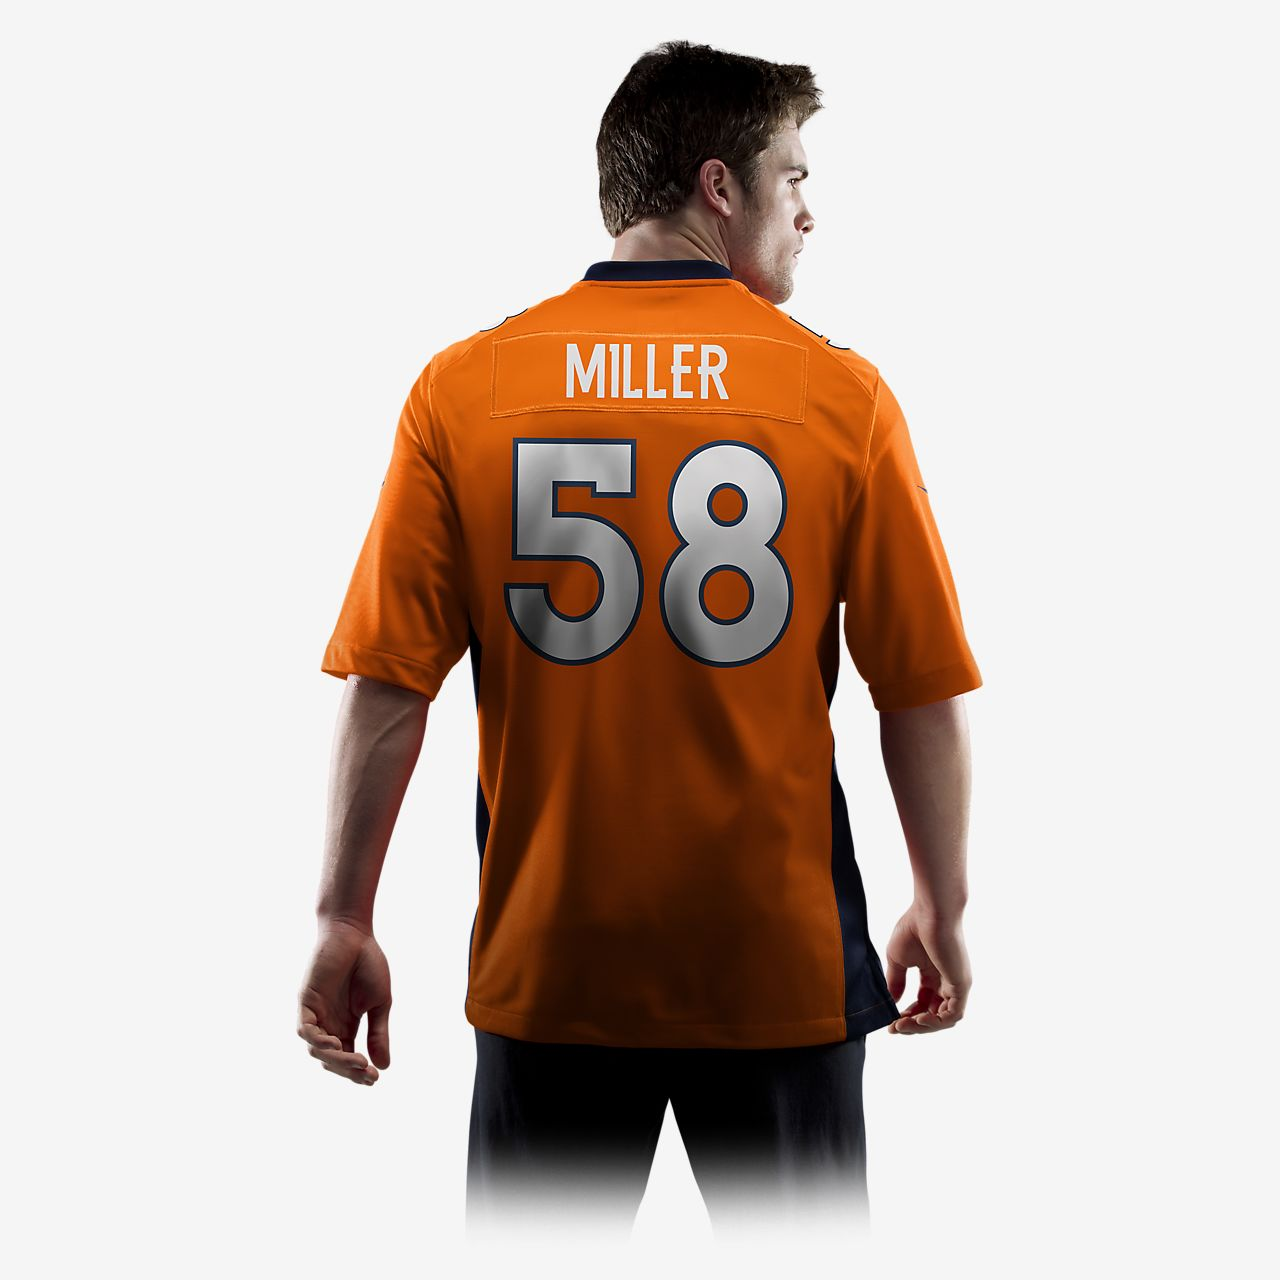 ... Camiseta oficial de fútbol americano de local para hombre NFL Denver  Broncos (Von Miller) 4cae6398f95